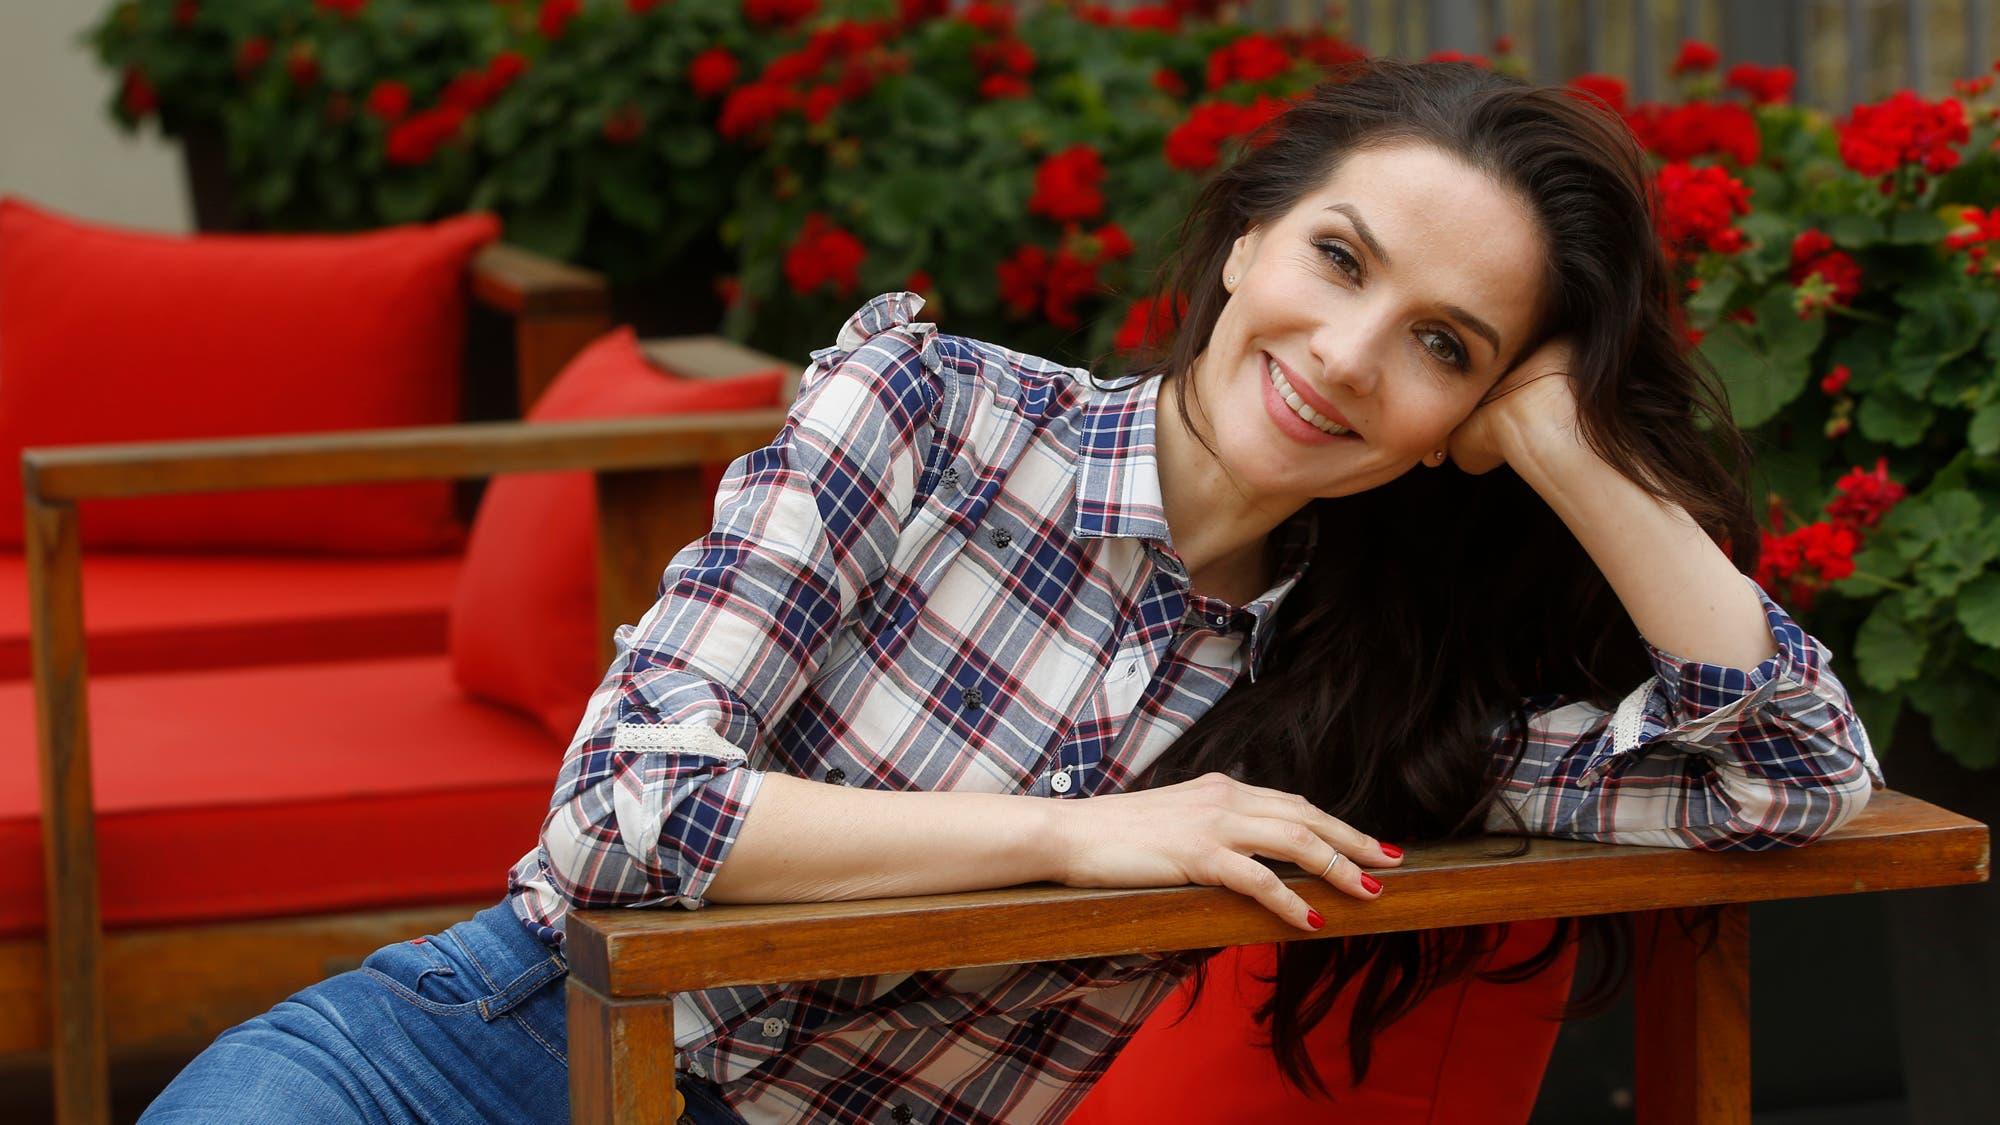 Natalia Oreiro mostró sus dotes como contorsionista en el tren Transiberiano